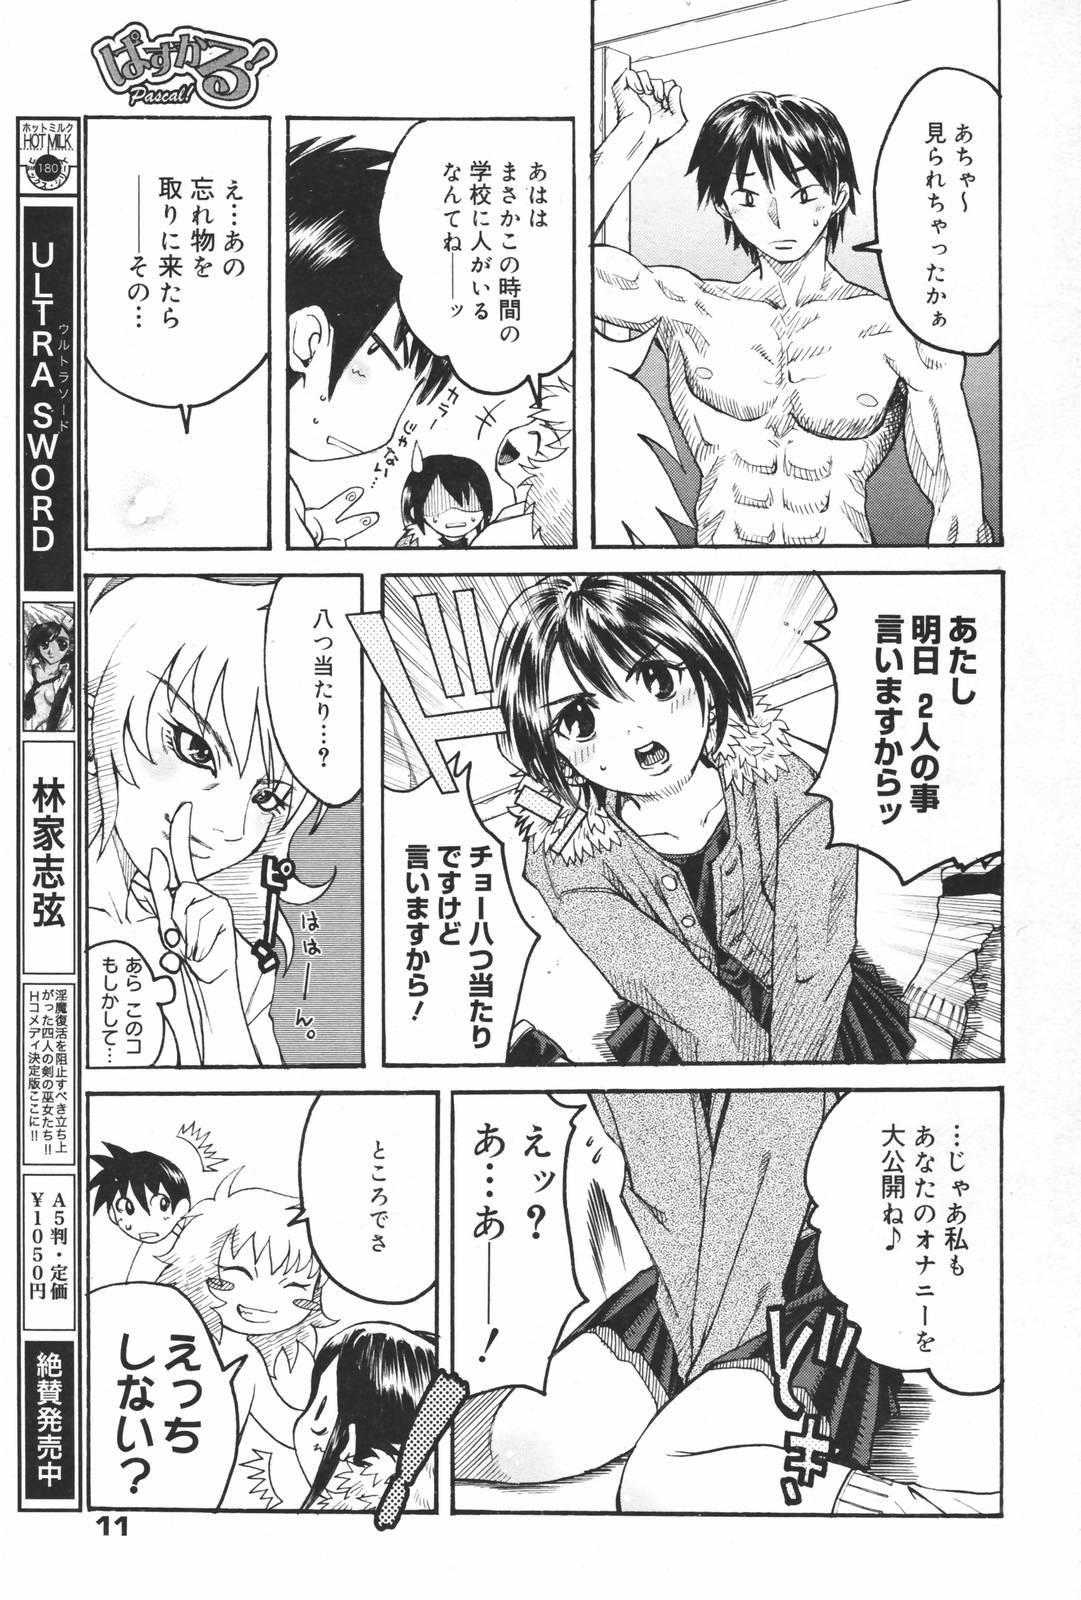 Manga Bangaichi 2007-03 10